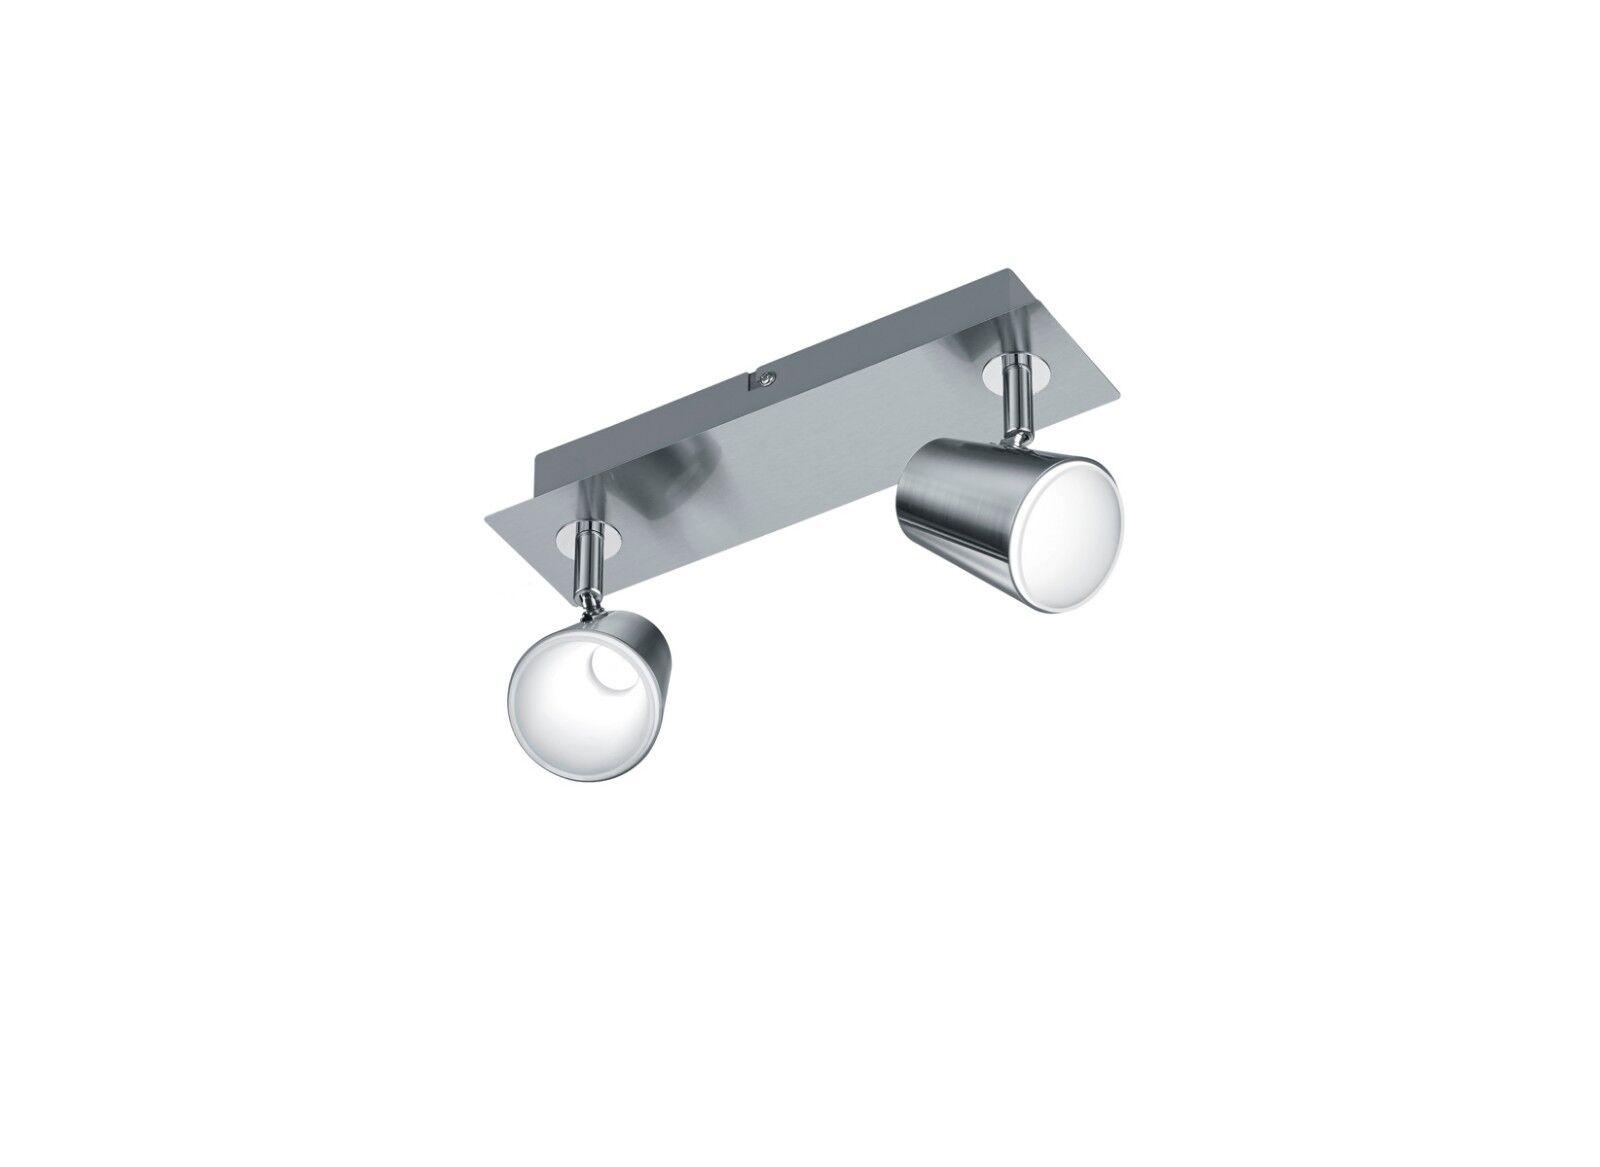 Applique spot a led 12w moderno nickel orientabile coll. trio 873170207 Narcos